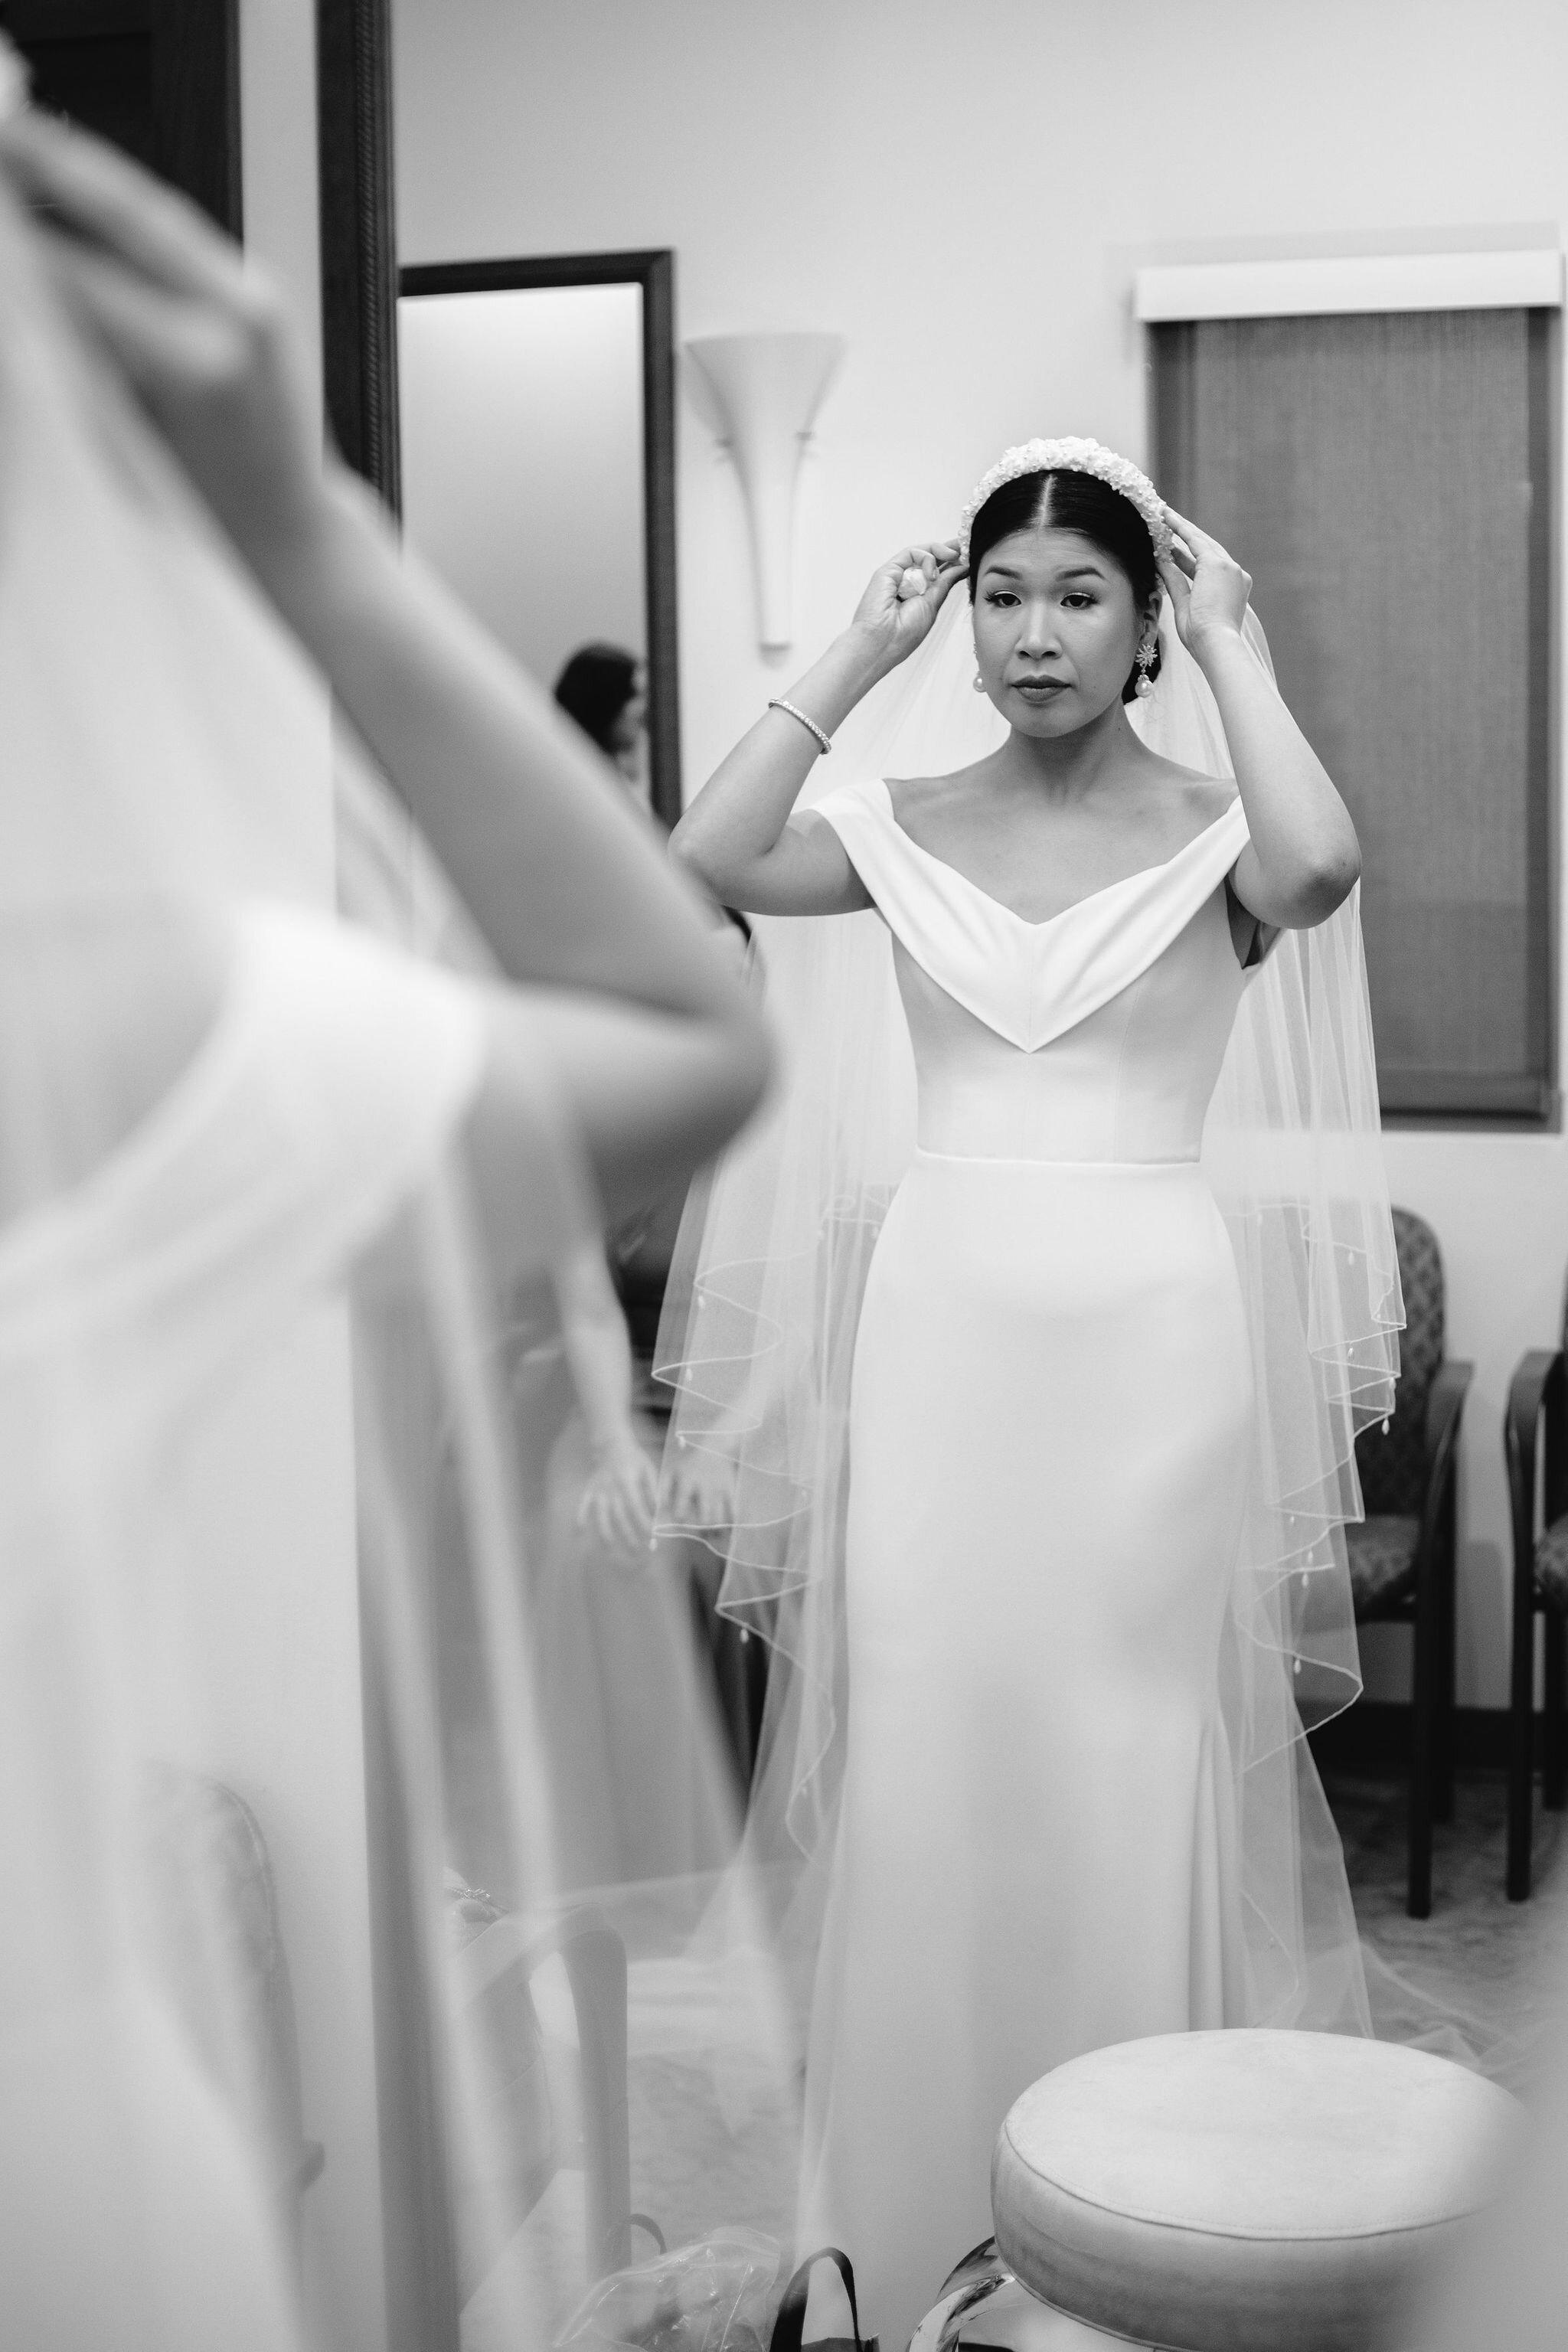 vietnamese-bride-getting-ready